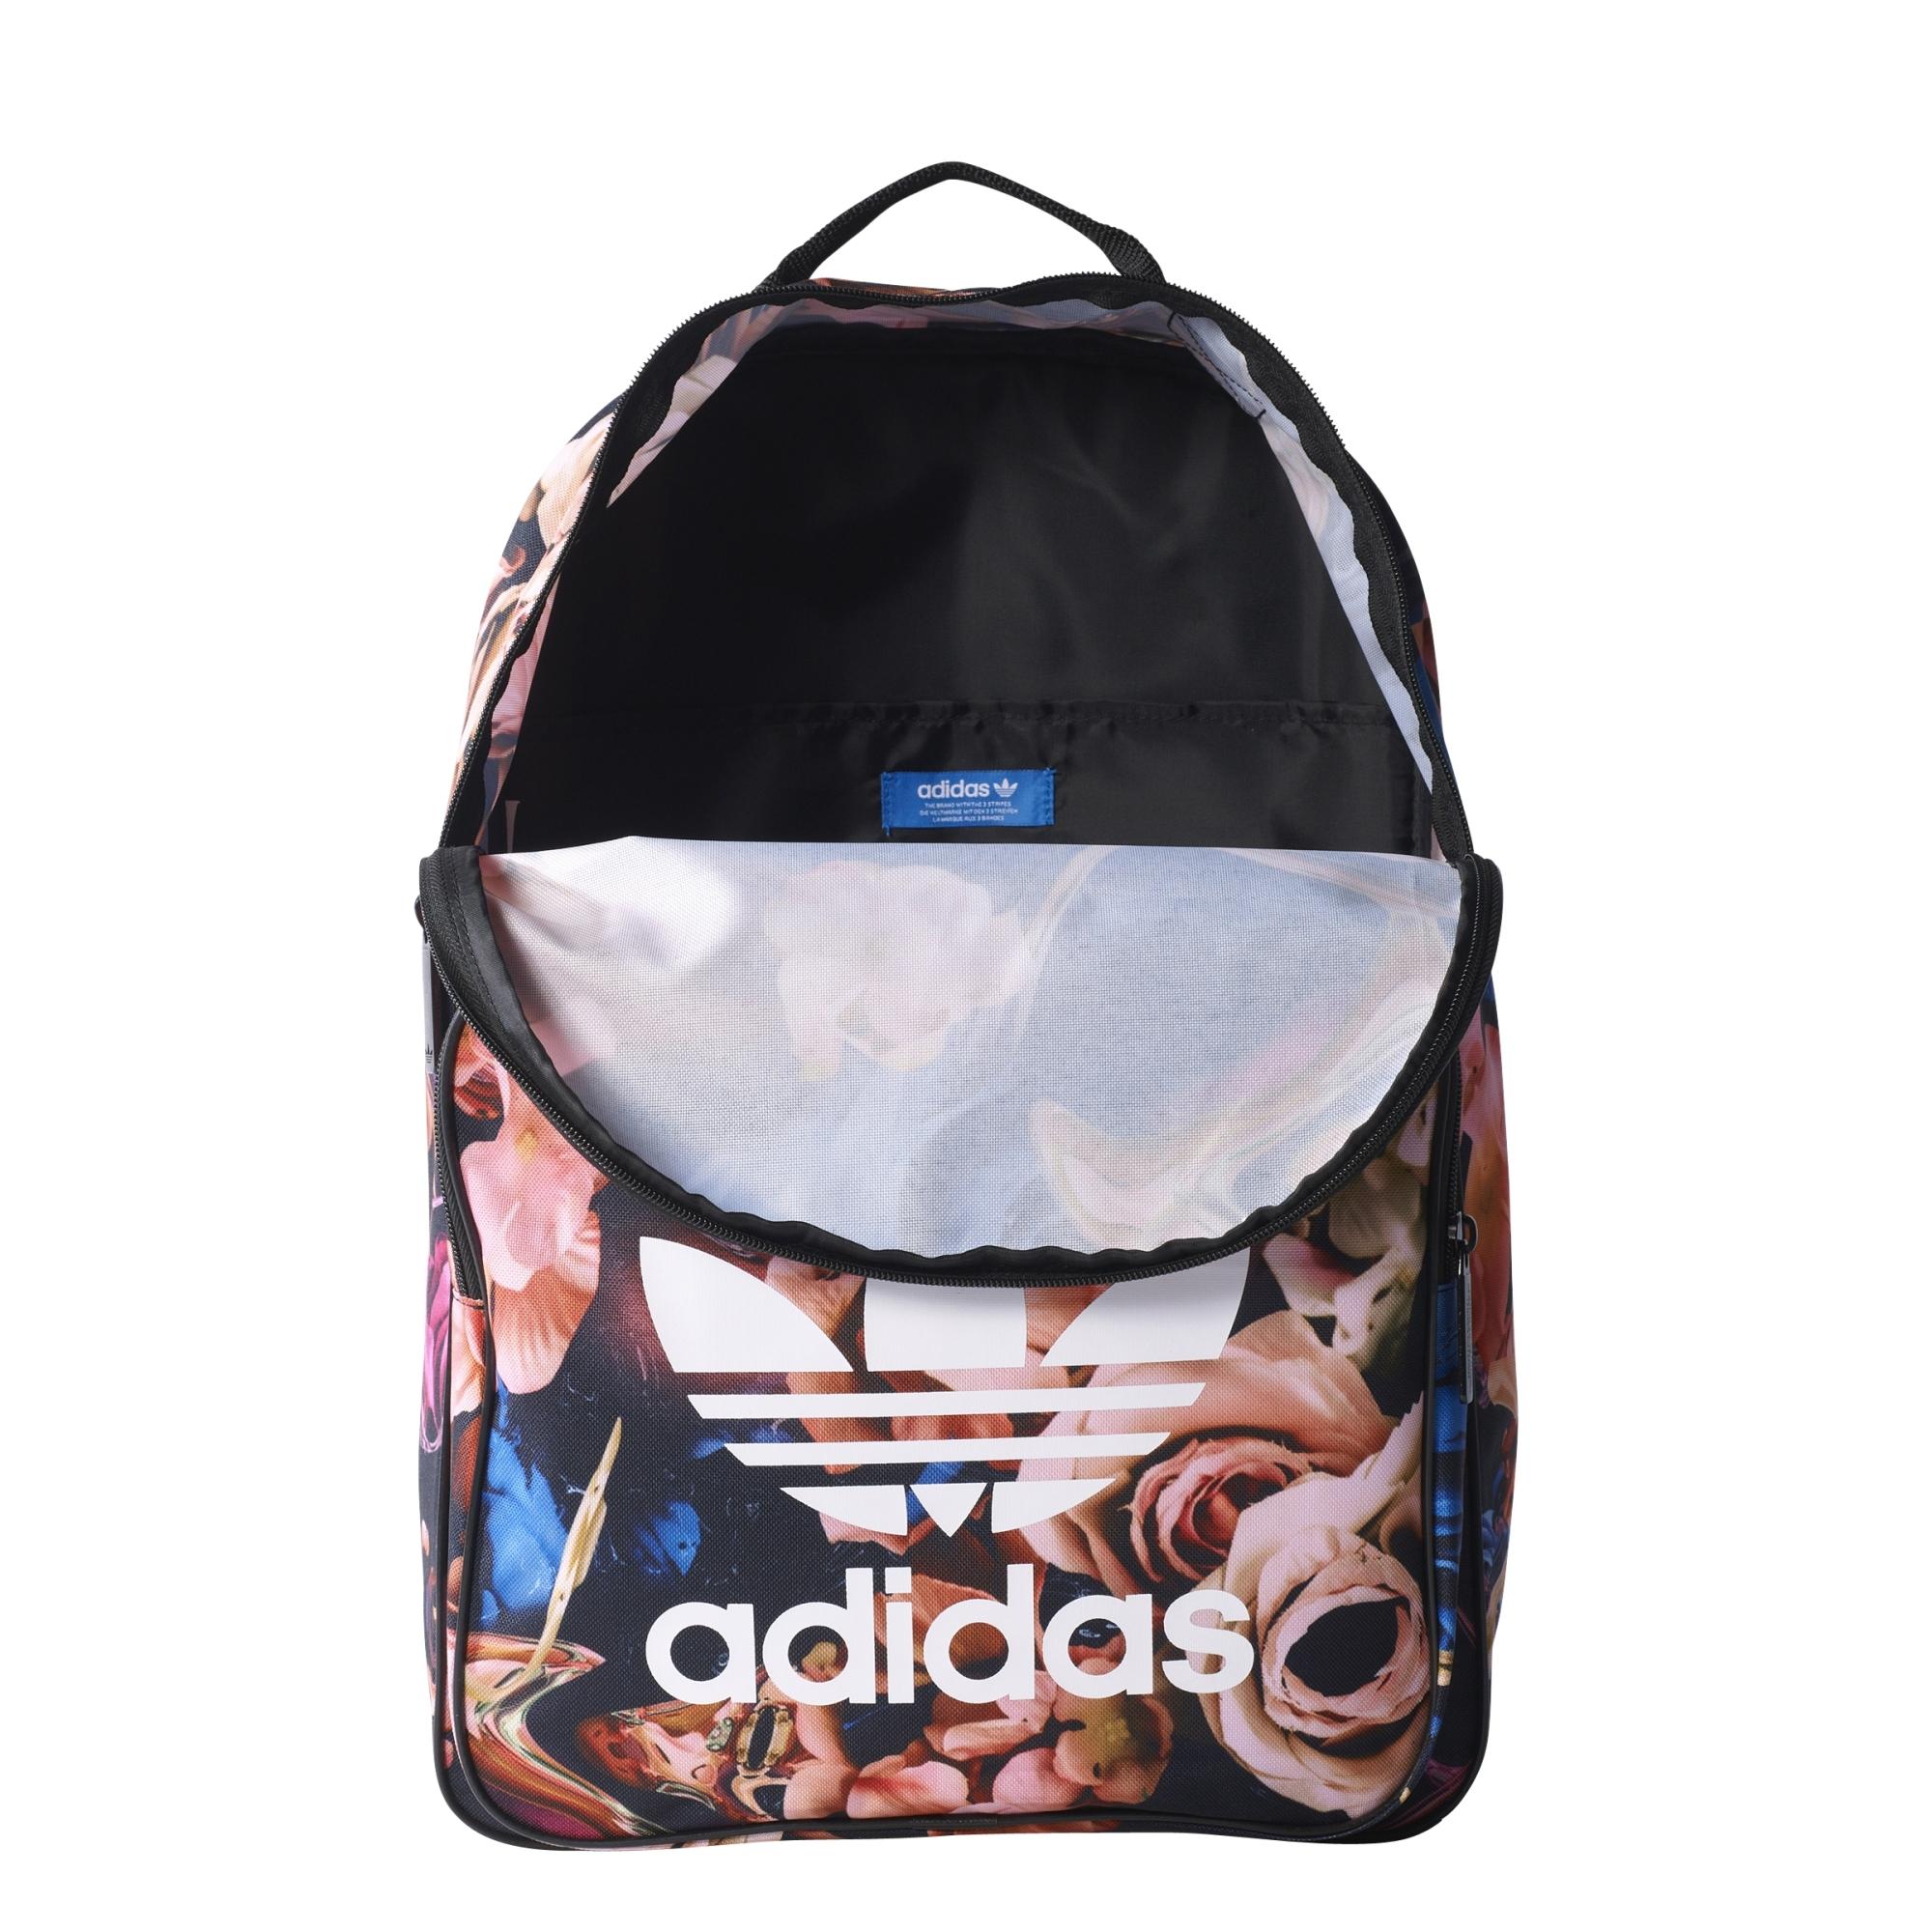 b62469ab20ad ... Adidas Originals Classic Backpack